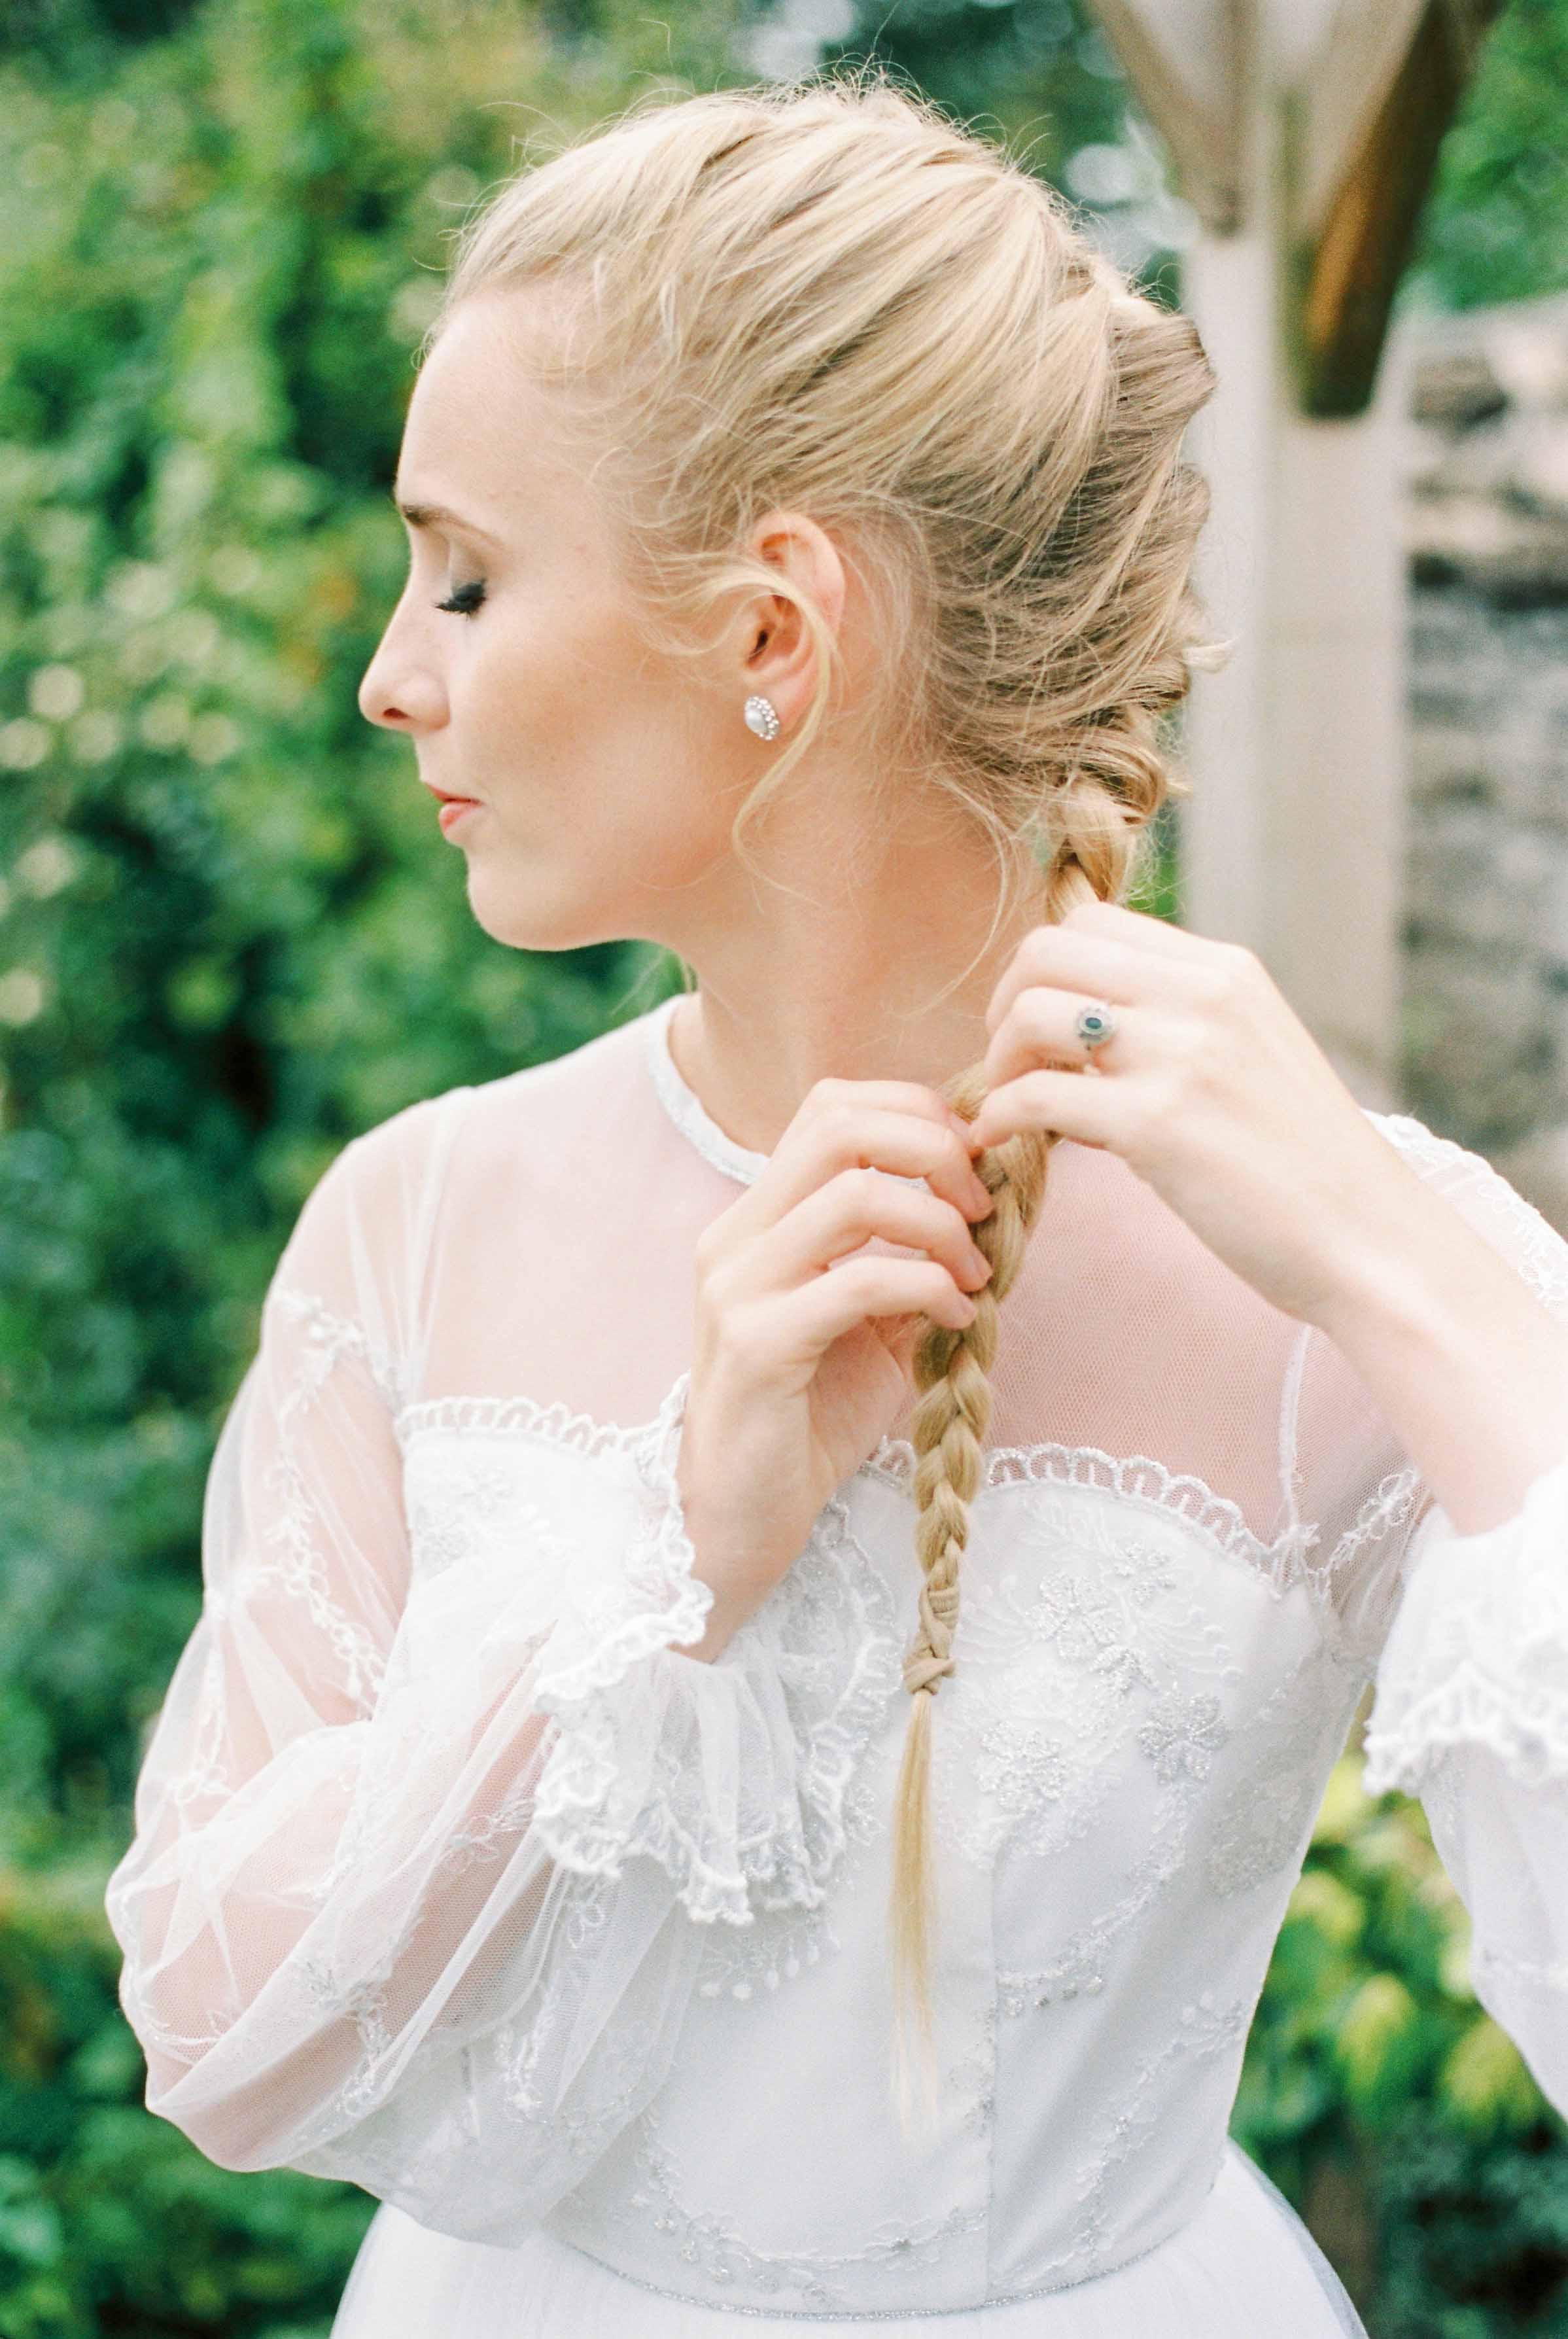 dorset-fine-art-wedding-photographer_amelia_carmencita_lores-5-of-24